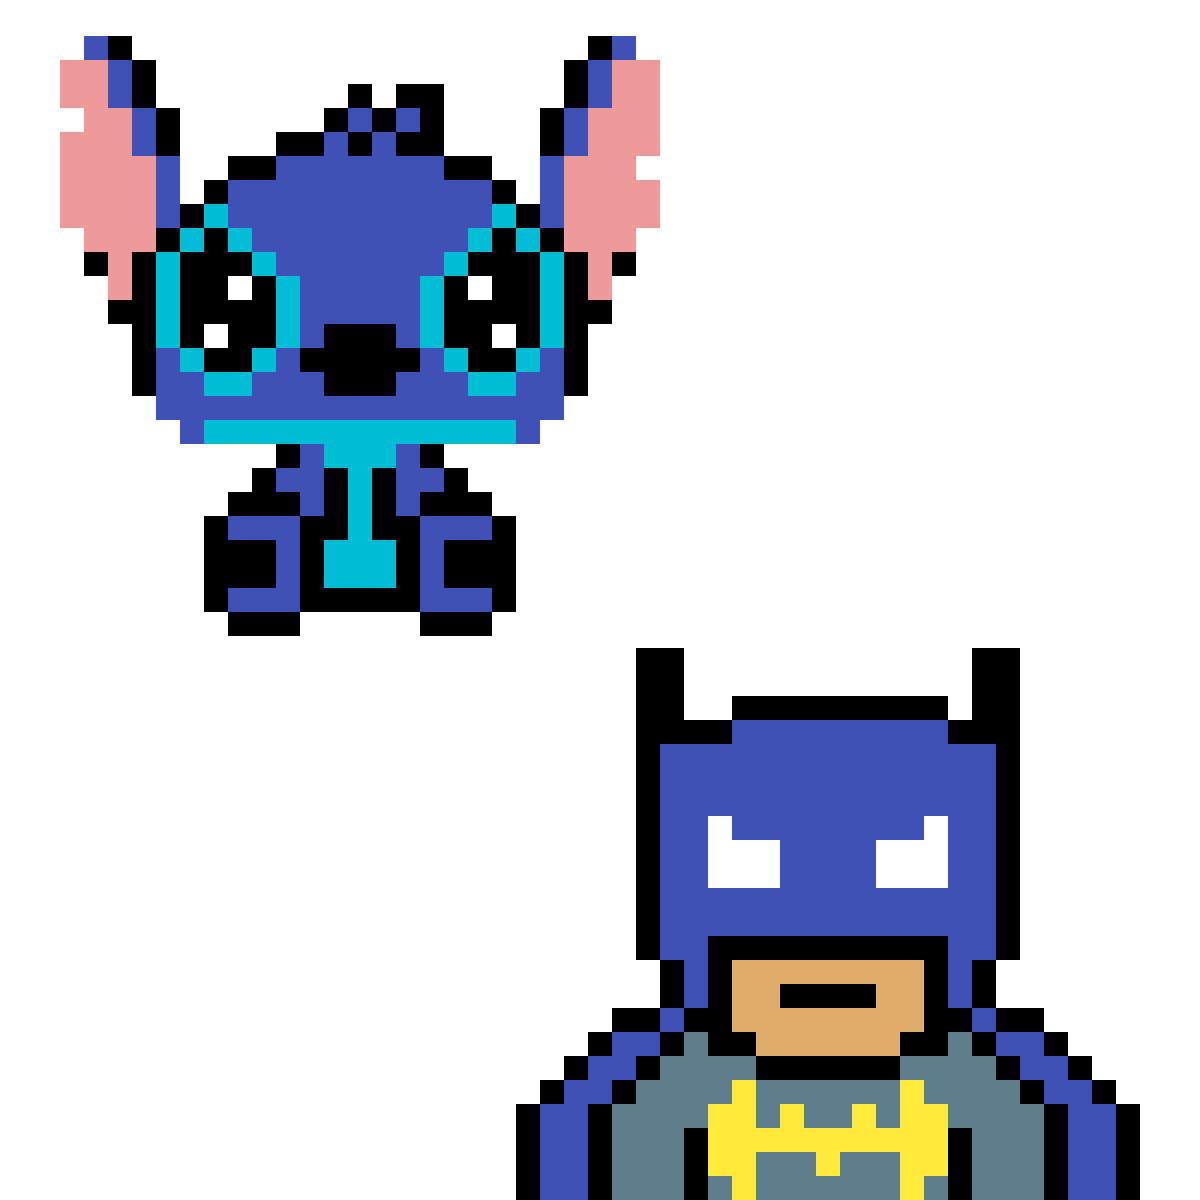 Stich and batman by Tpera